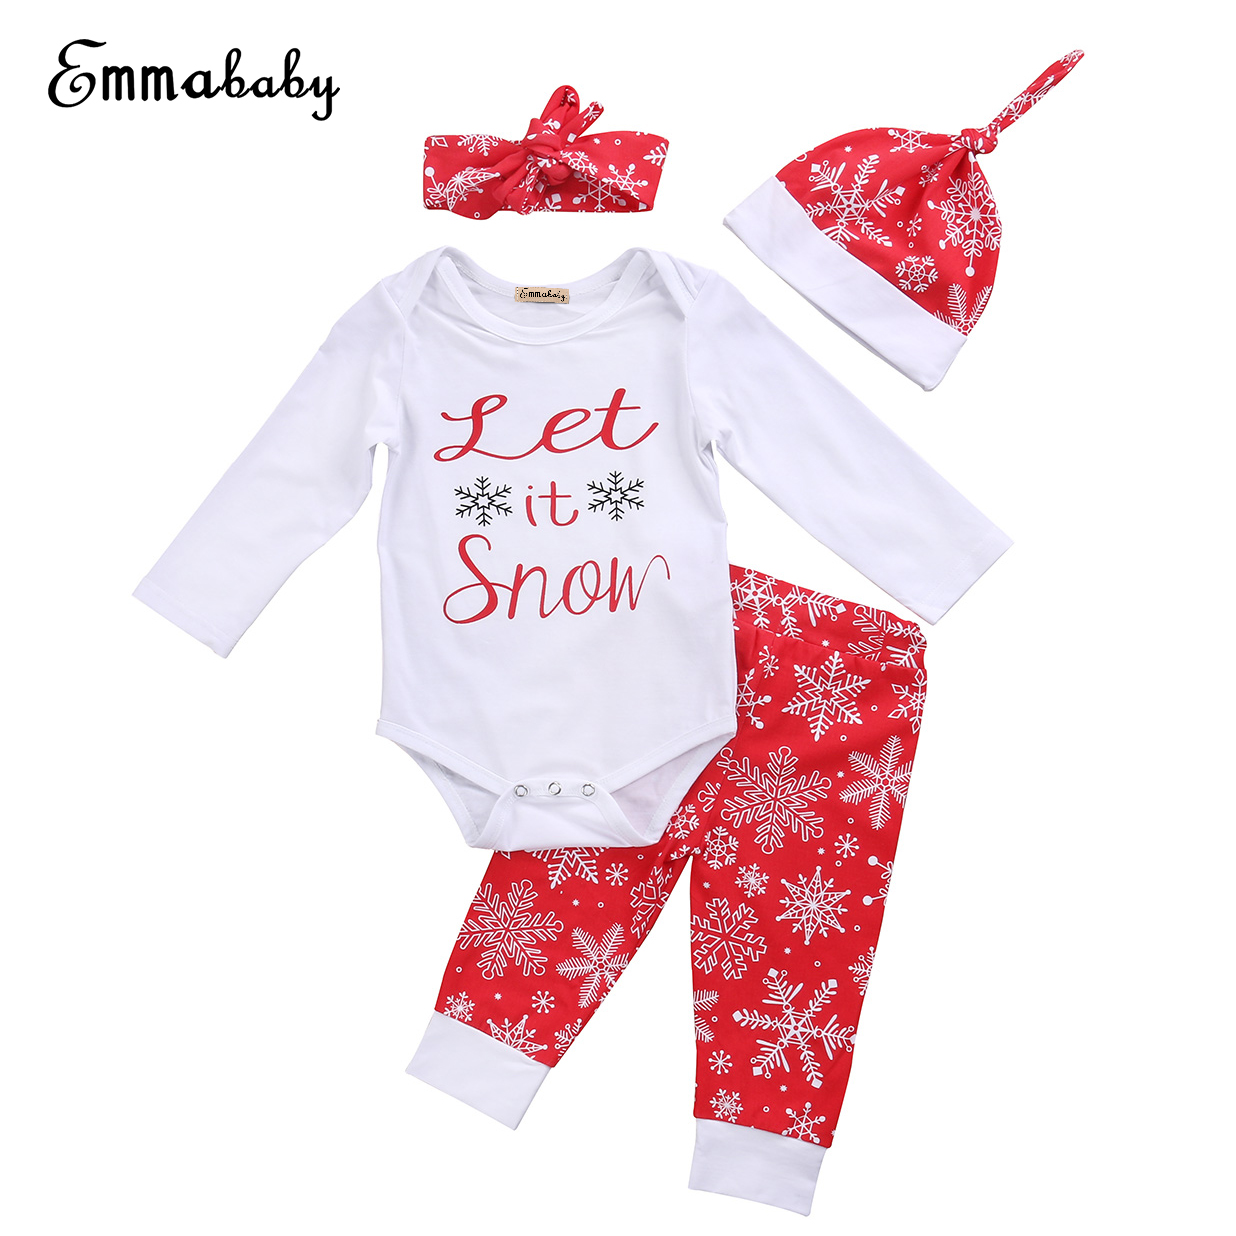 Emmababy 2017 0-24M Newborn Toddler Baby Girls Clothes Autumn Warm 4PCS Set Long Sleeve Bodysuits+Long Snow Pants+Hat+Headband